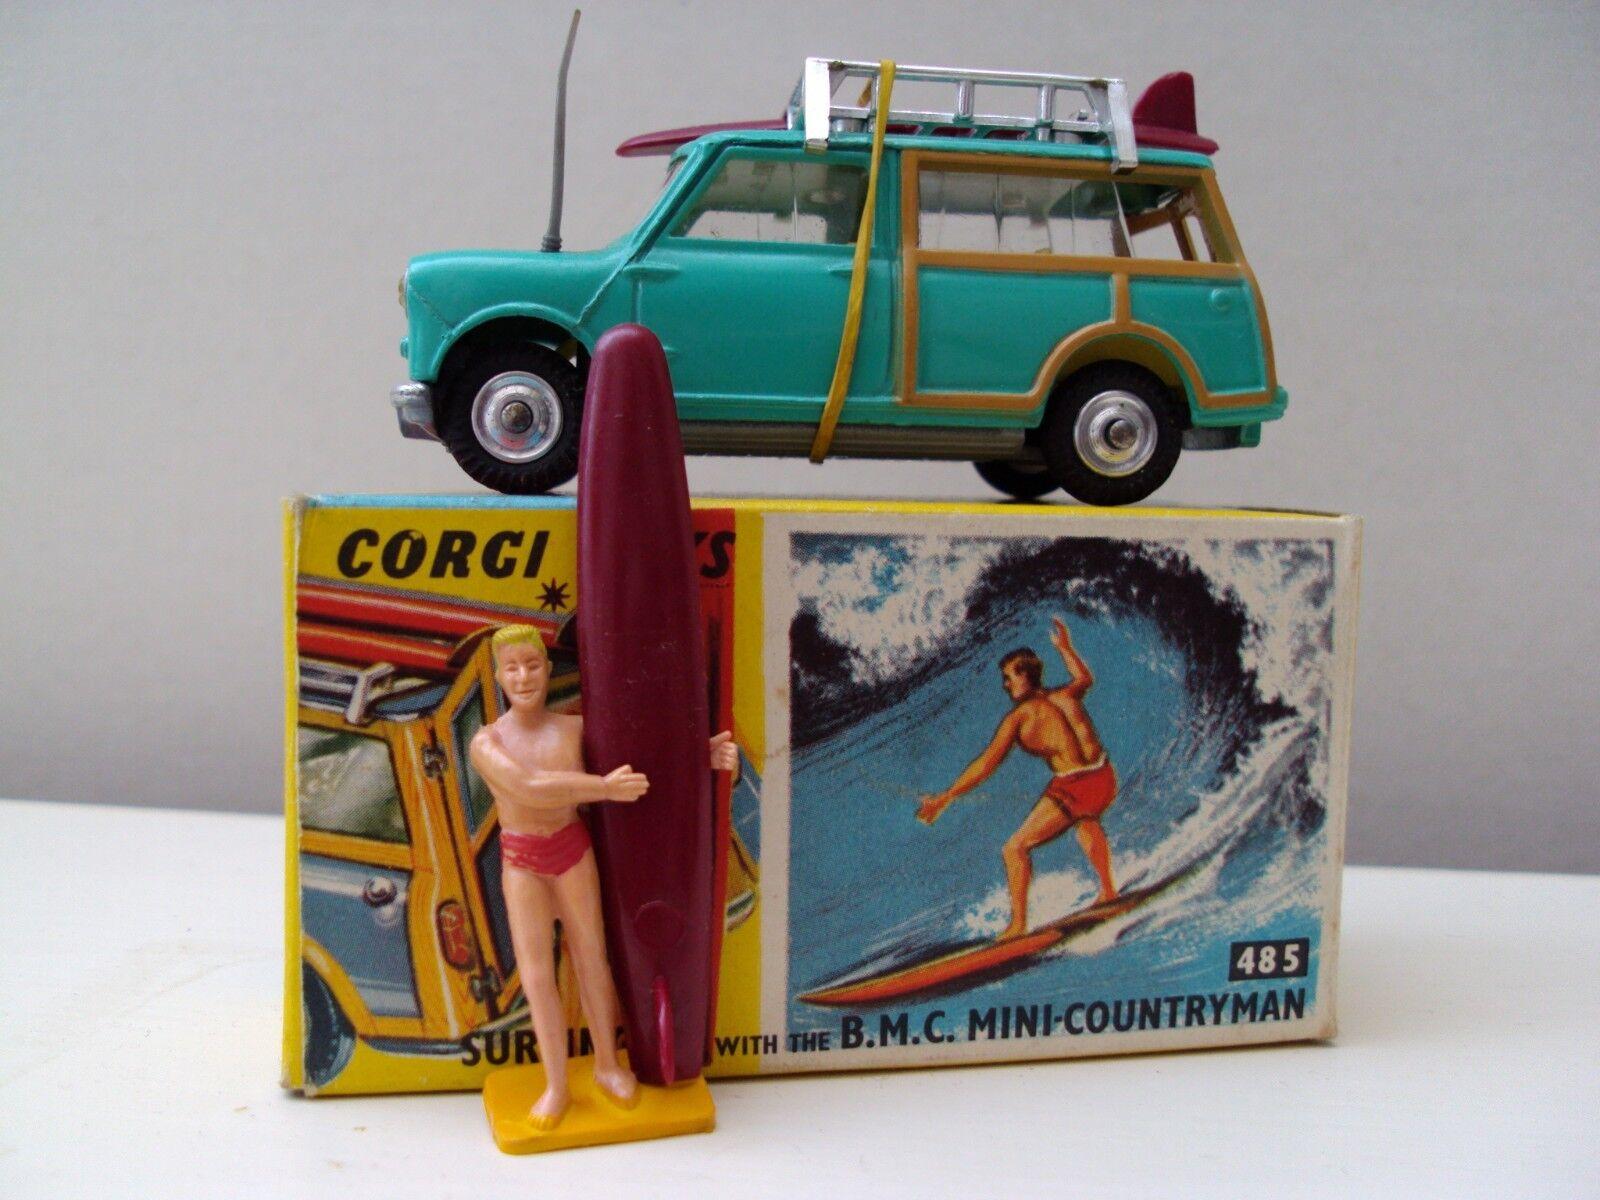 Corgi Toys Mini Countryman with Surfer (No 485)